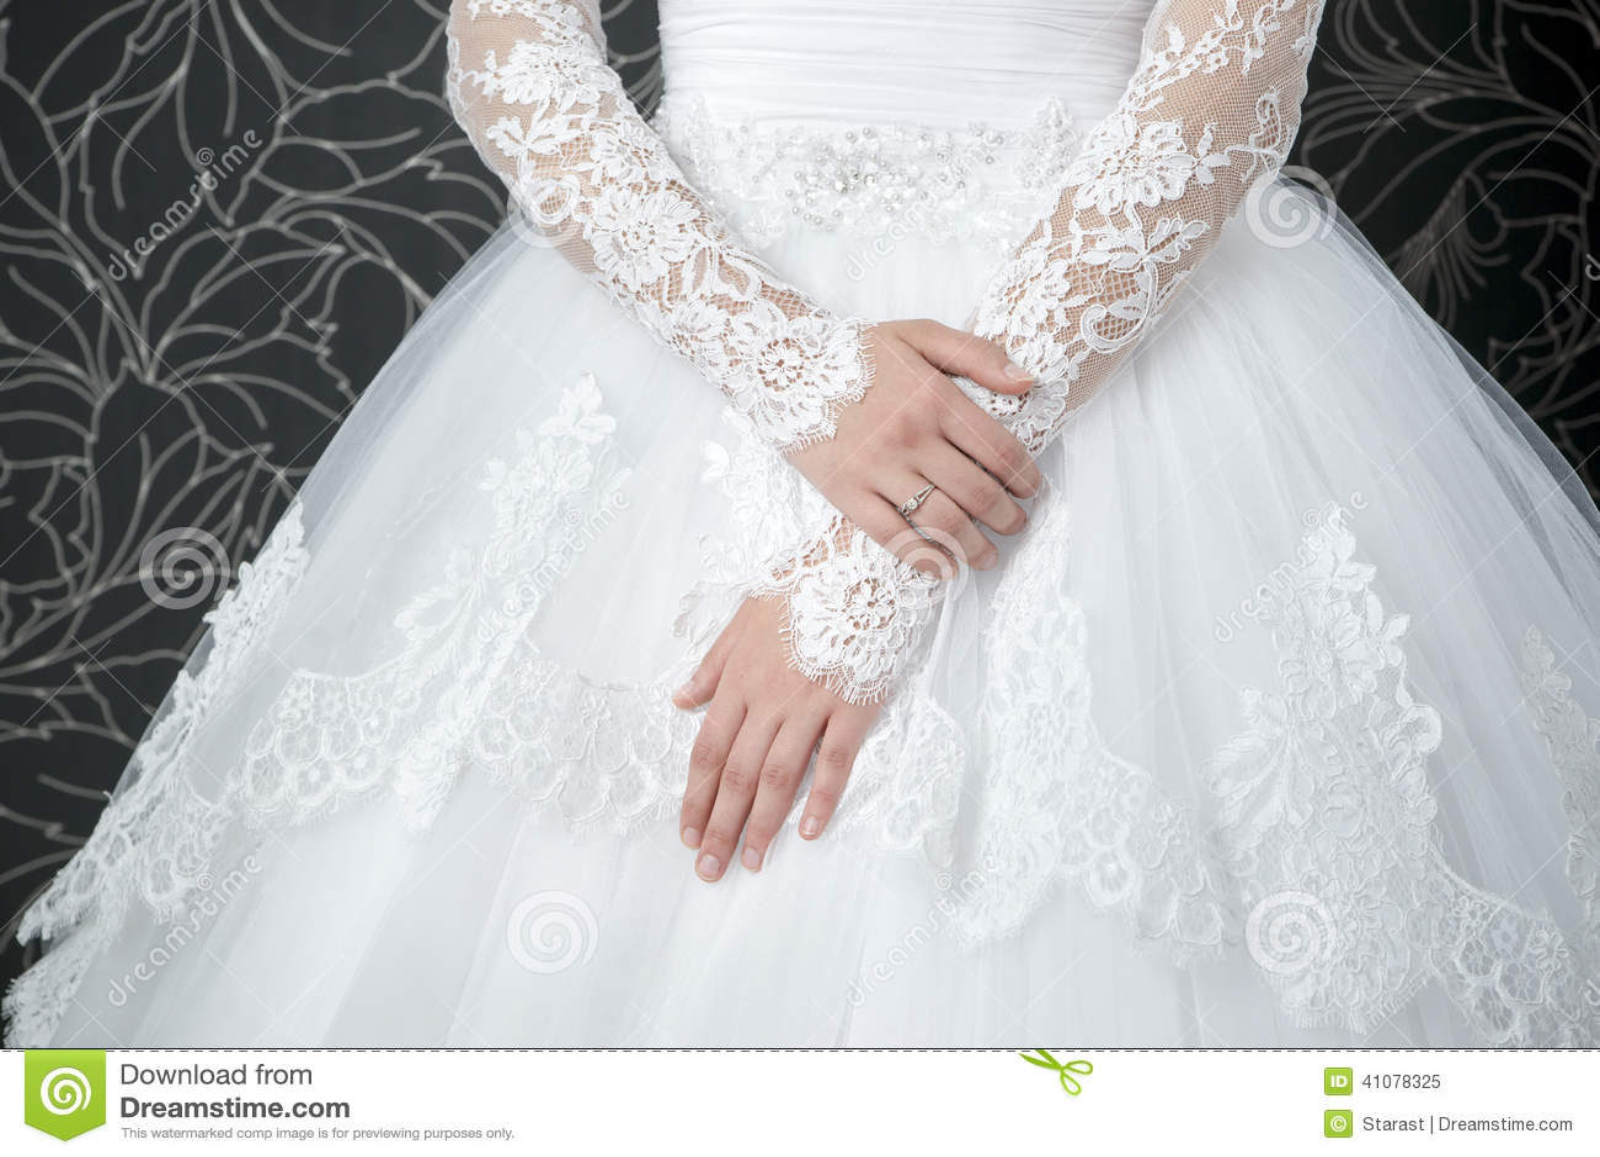 royalty free stock photos wedding white dress lace brides back image all white wedding dress Lace white wedding dress with long sleeves Royalty Free Stock Photo